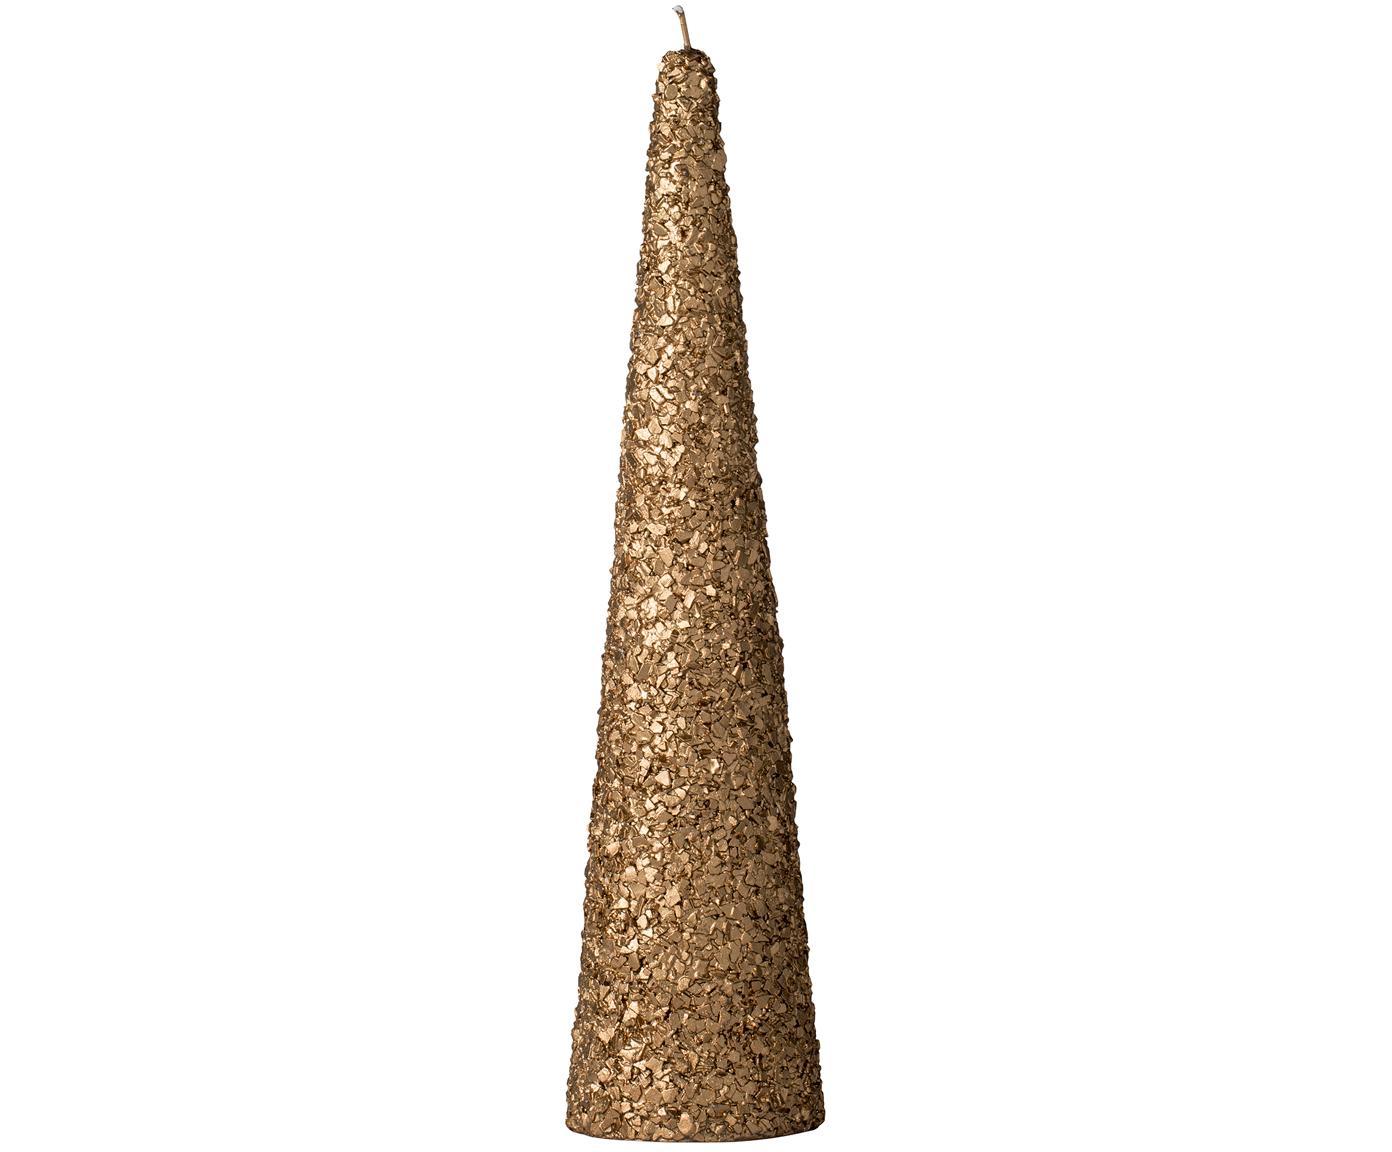 Vela decorativa Gliteria, Parafina, Bronce, Ø 7 x Al 30 cm